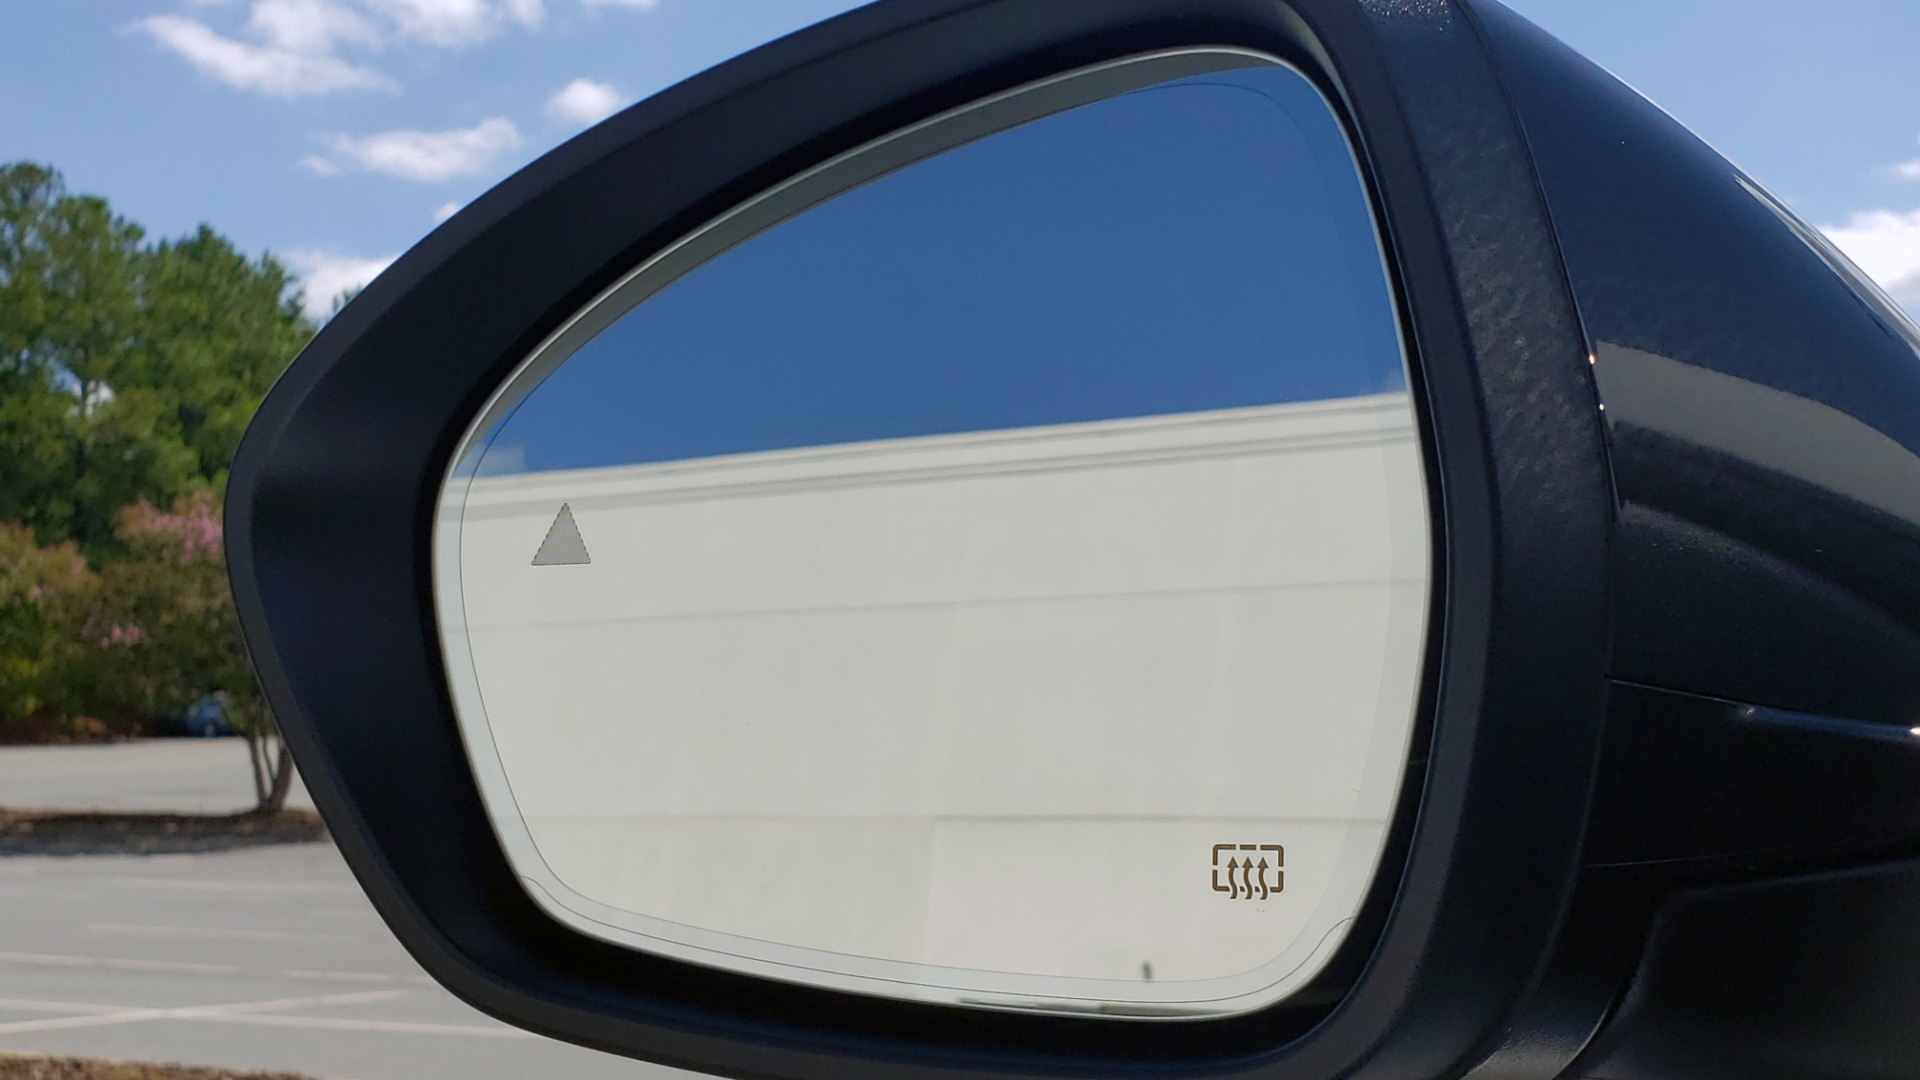 Used 2019 Alfa Romeo STELVIO TI SPORT AWD / 2.0L TURBO / 8-SPD AUTO / DRVR ASST / REARVIEW for sale $37,495 at Formula Imports in Charlotte NC 28227 31